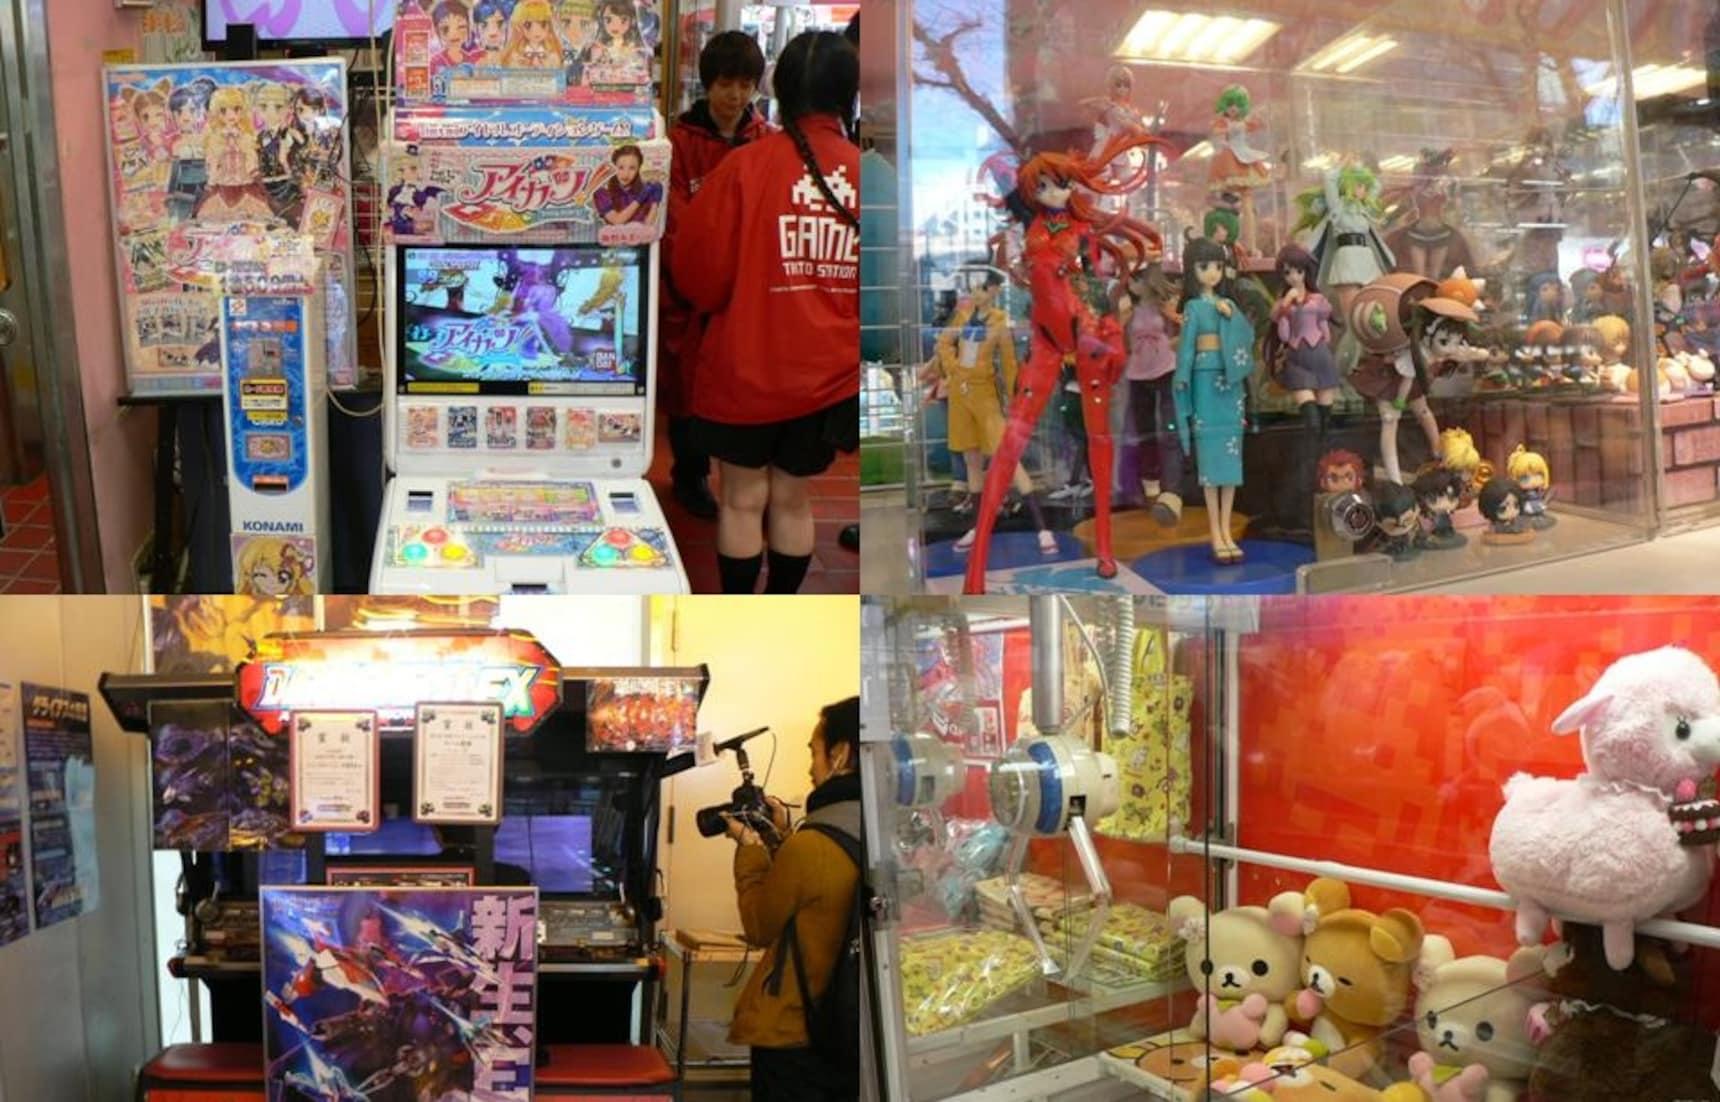 日本游戏厅初体验,TAITO STATION秋叶原店欢乐游